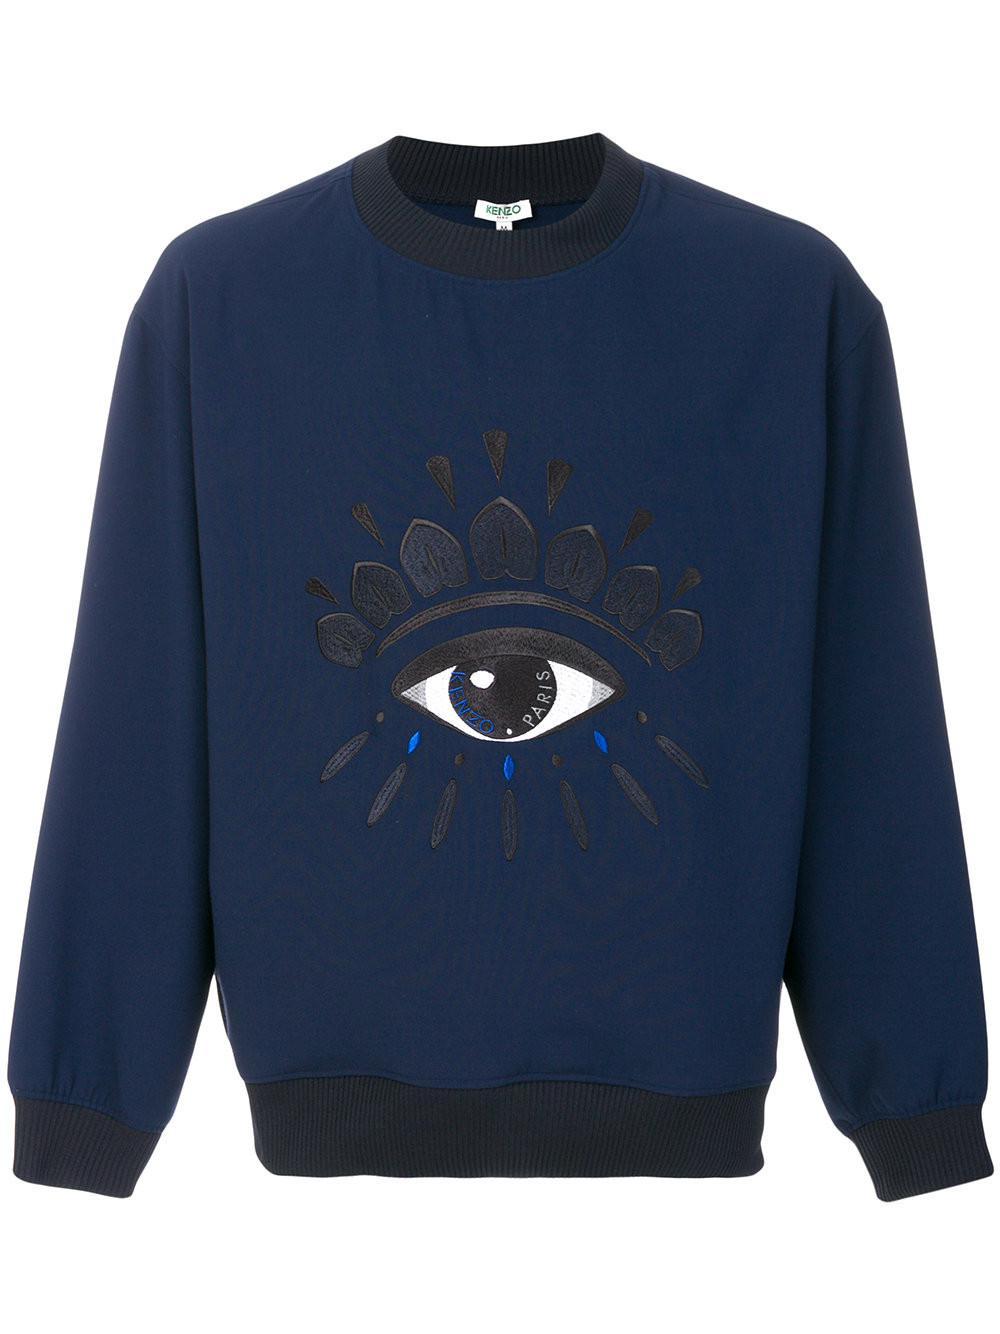 03ac0eeef KENZO - Blue Embroidered Eye Sweatshirt for Men - Lyst. View fullscreen